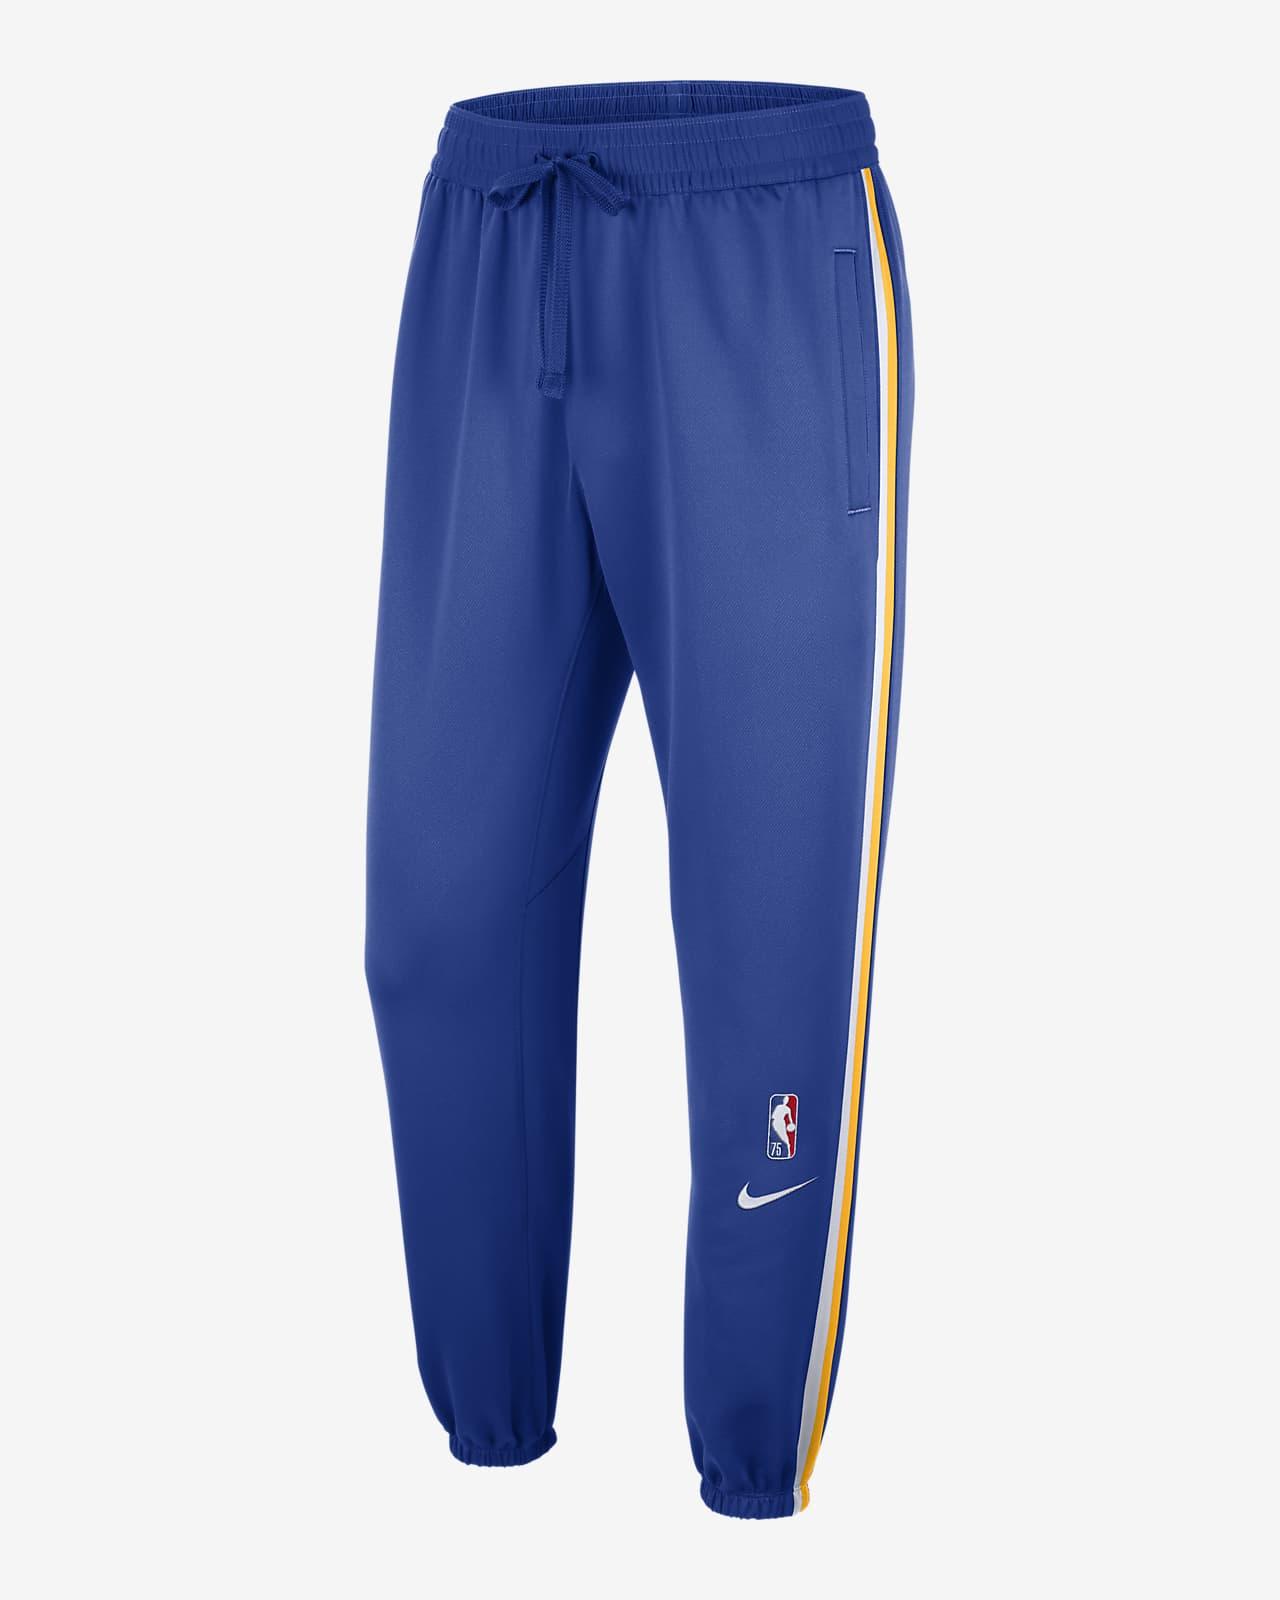 Golden State Warriors Showtime Men's Nike Dri-FIT NBA Trousers